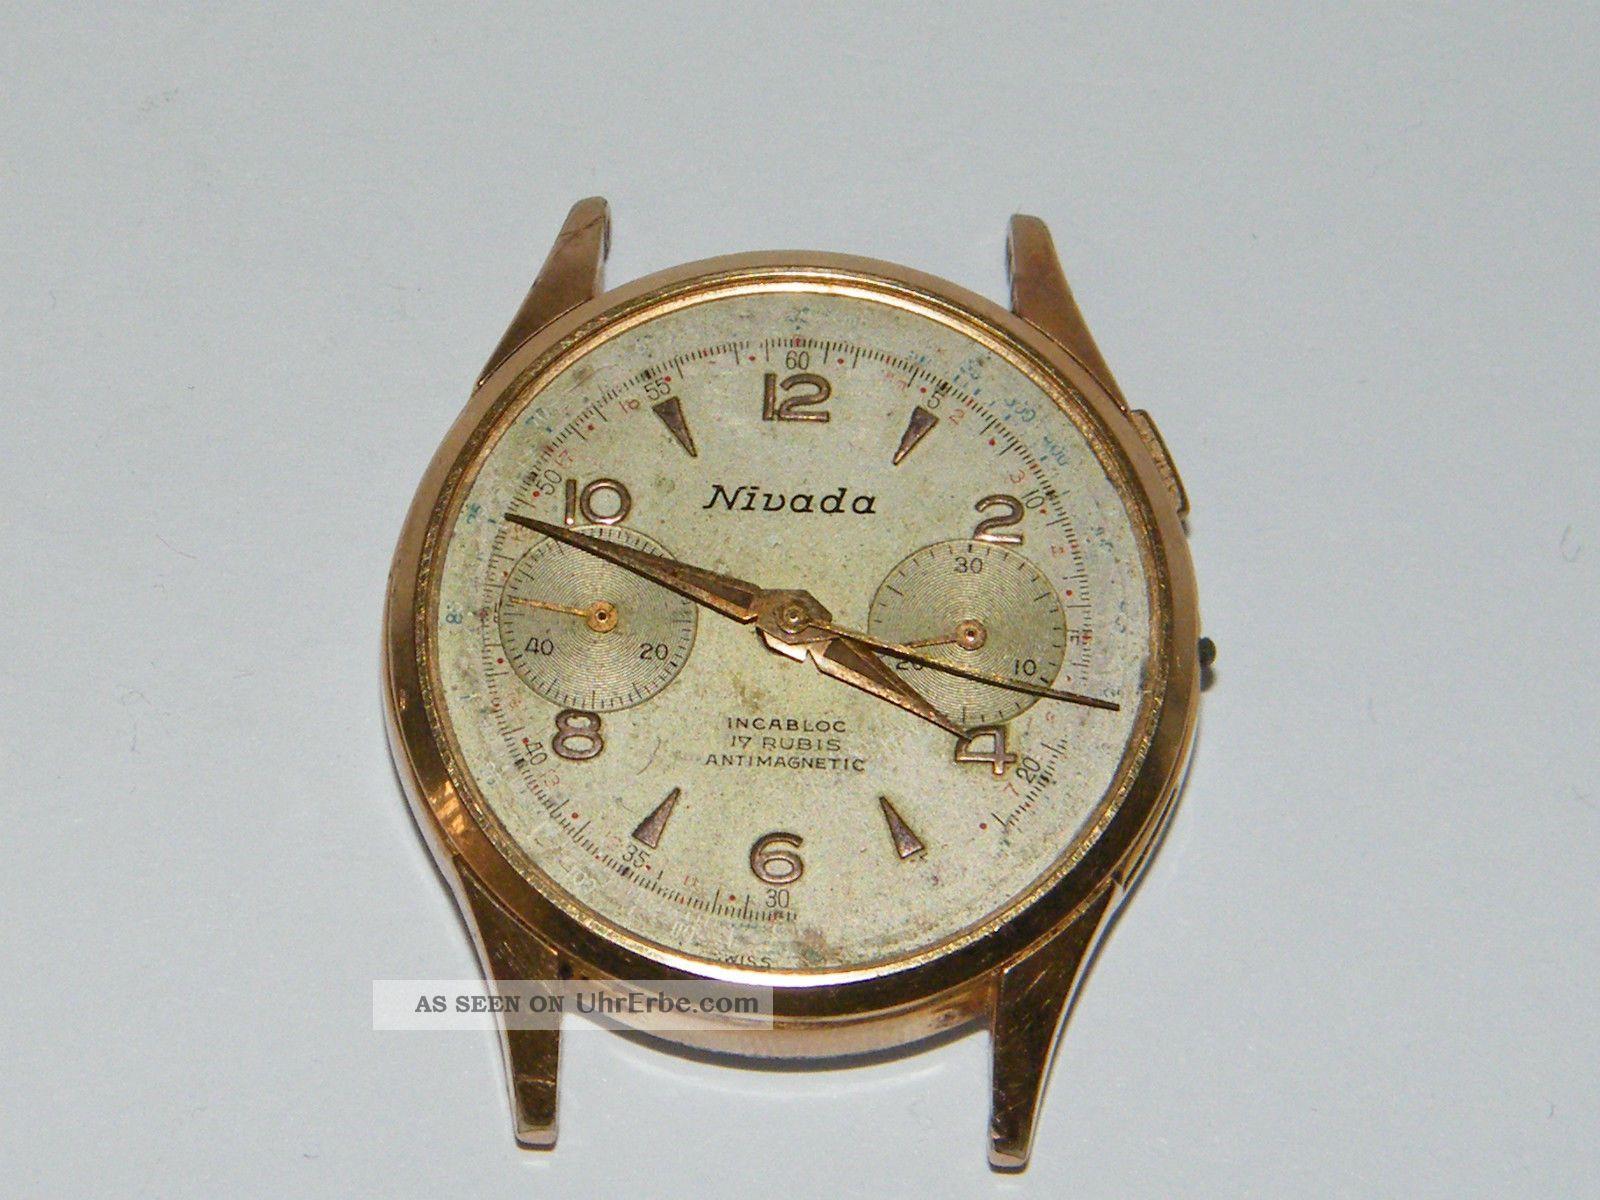 Nivada Chronograph Vintage Handaufzug,  Wrist Watch,  Repair,  Cal Landeron 248 Armbanduhren Bild